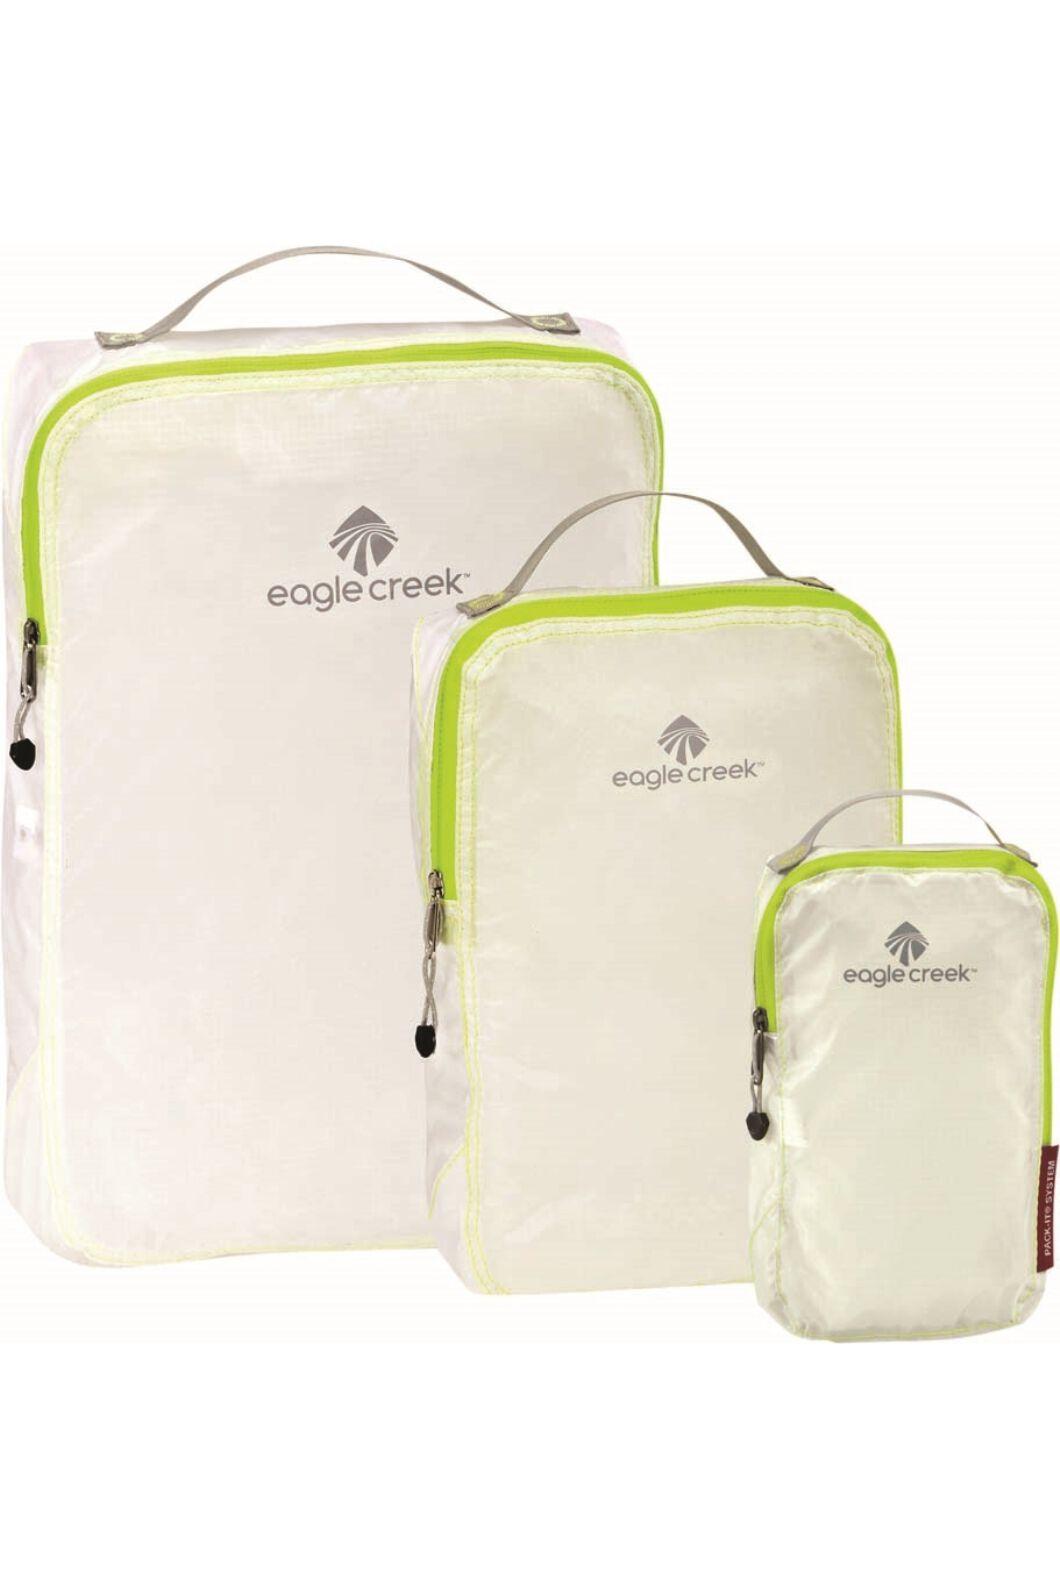 Eagle Creek Pack-It Specter Cube Settrobe, WHITE STROBE, hi-res